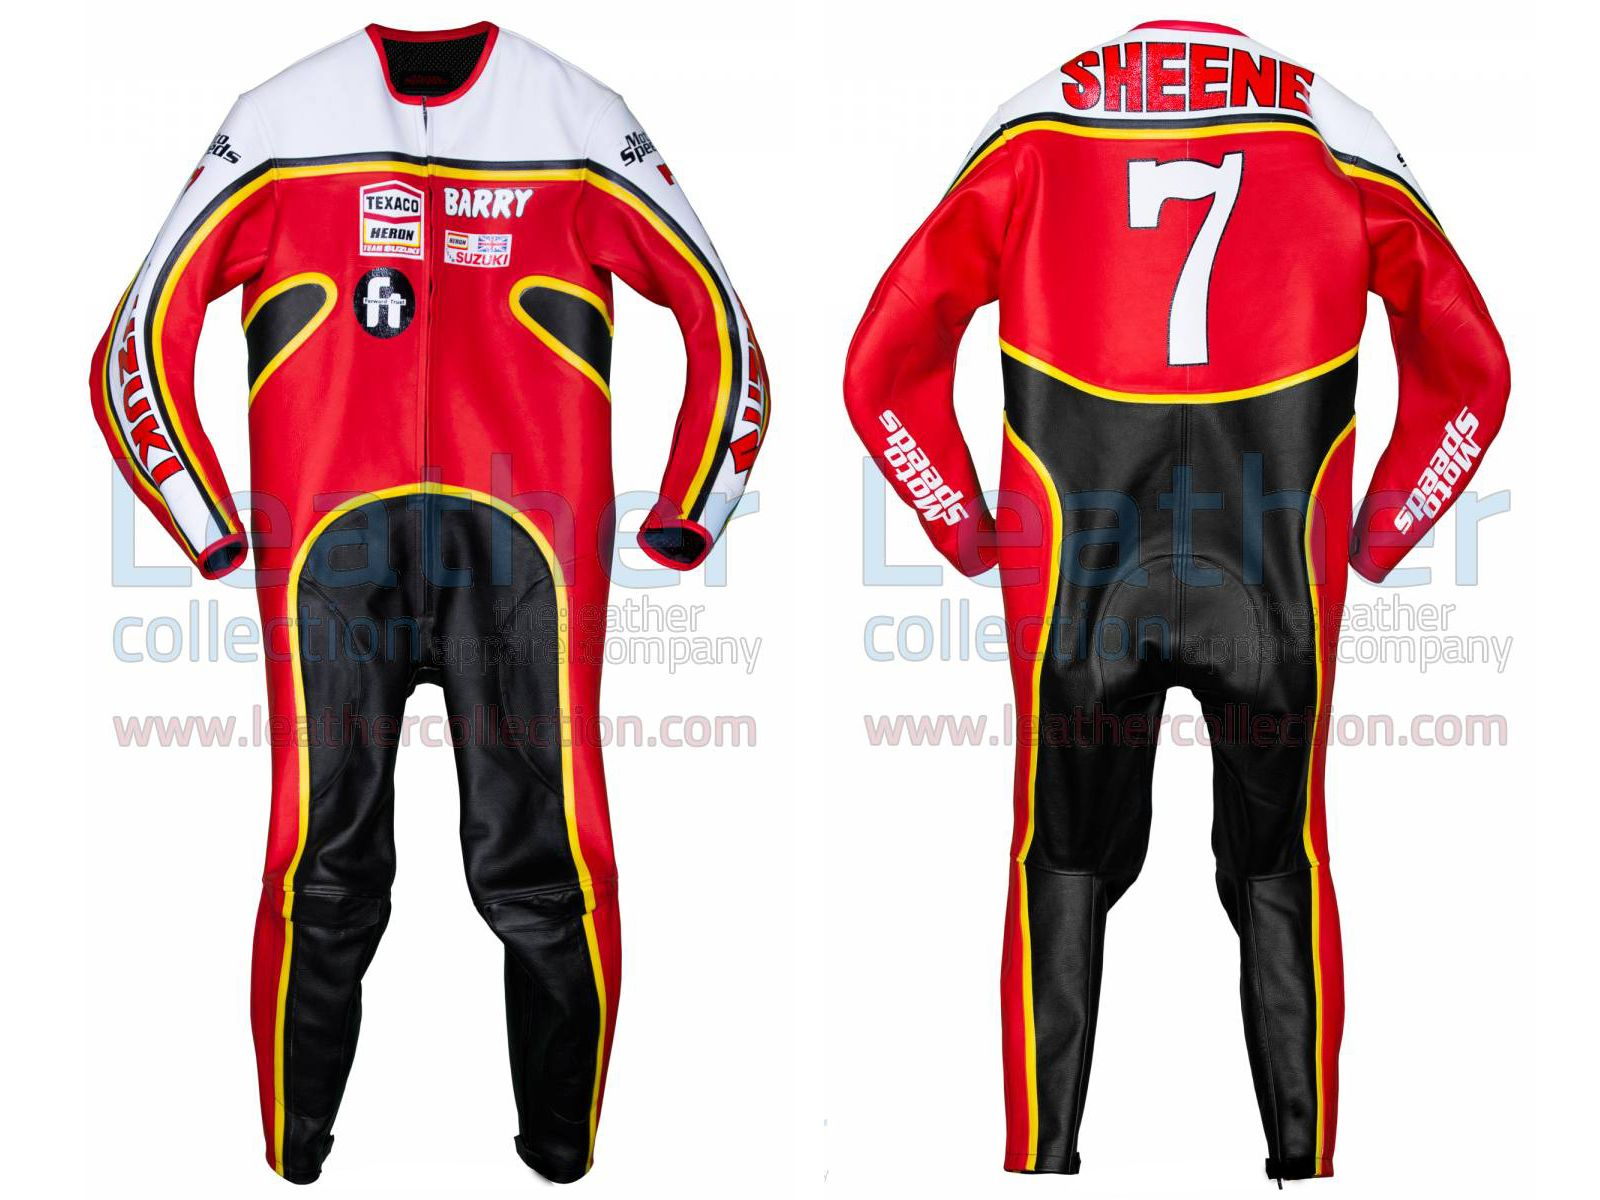 Barry Sheene Suzuki GP 1976 Leathers  https://www.leathercollection.com/en-we/barry-sheene-suzuki-gp-1976-leathers.html  #Barry_Sheene_Leathers, #Barry_Sheene_Suzuki_GP_1976_Leathers, #Suzuki_Leathers